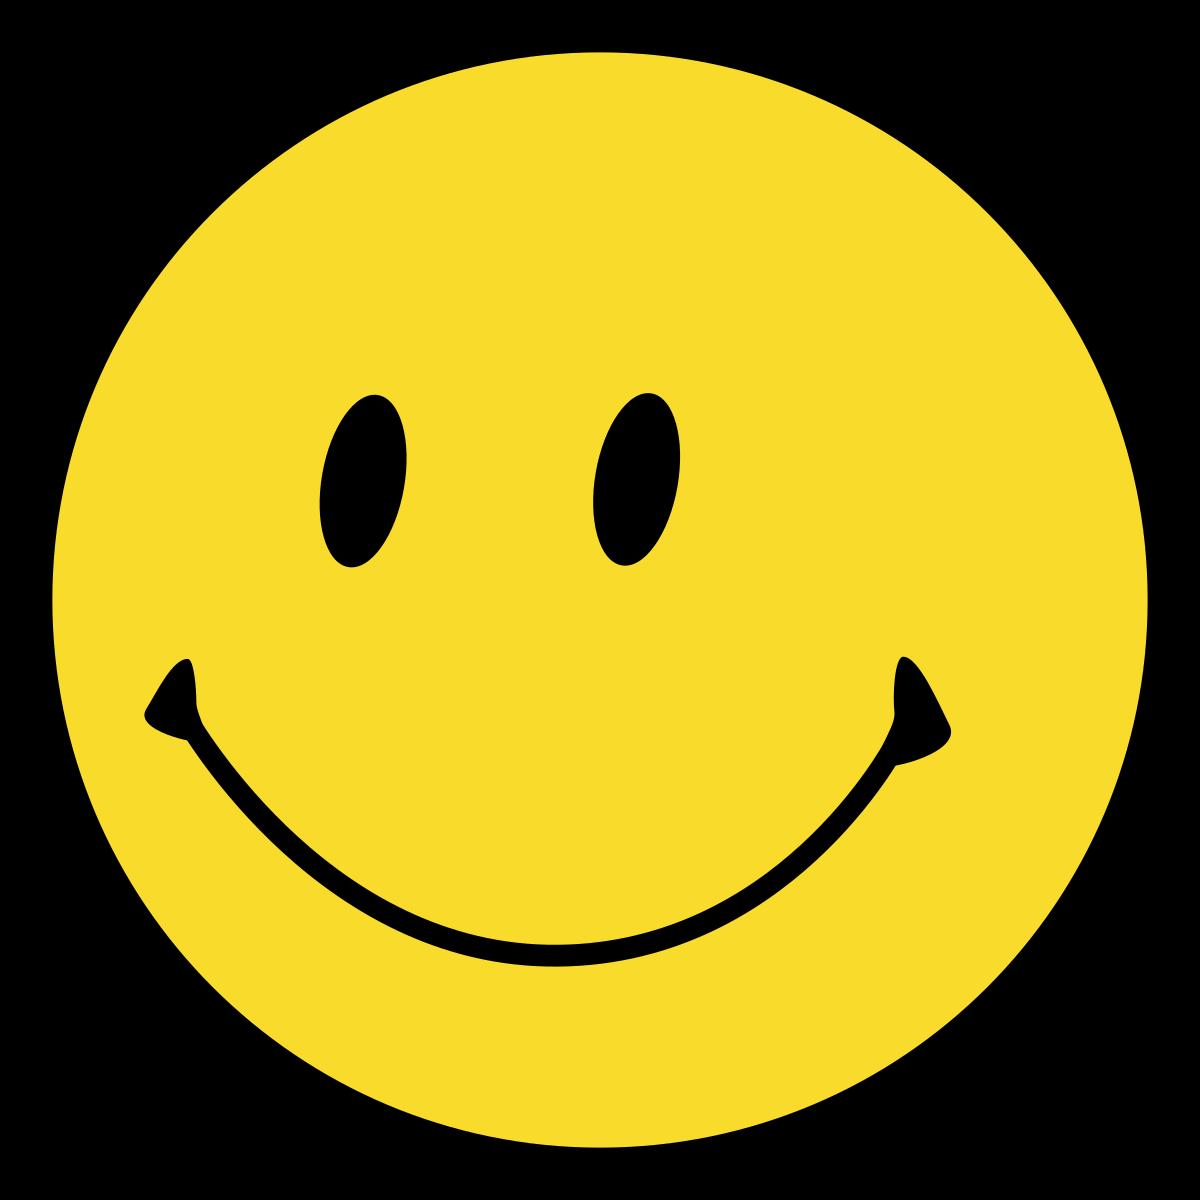 Clipart smile cheeky smile. Resultado de imagen smileys